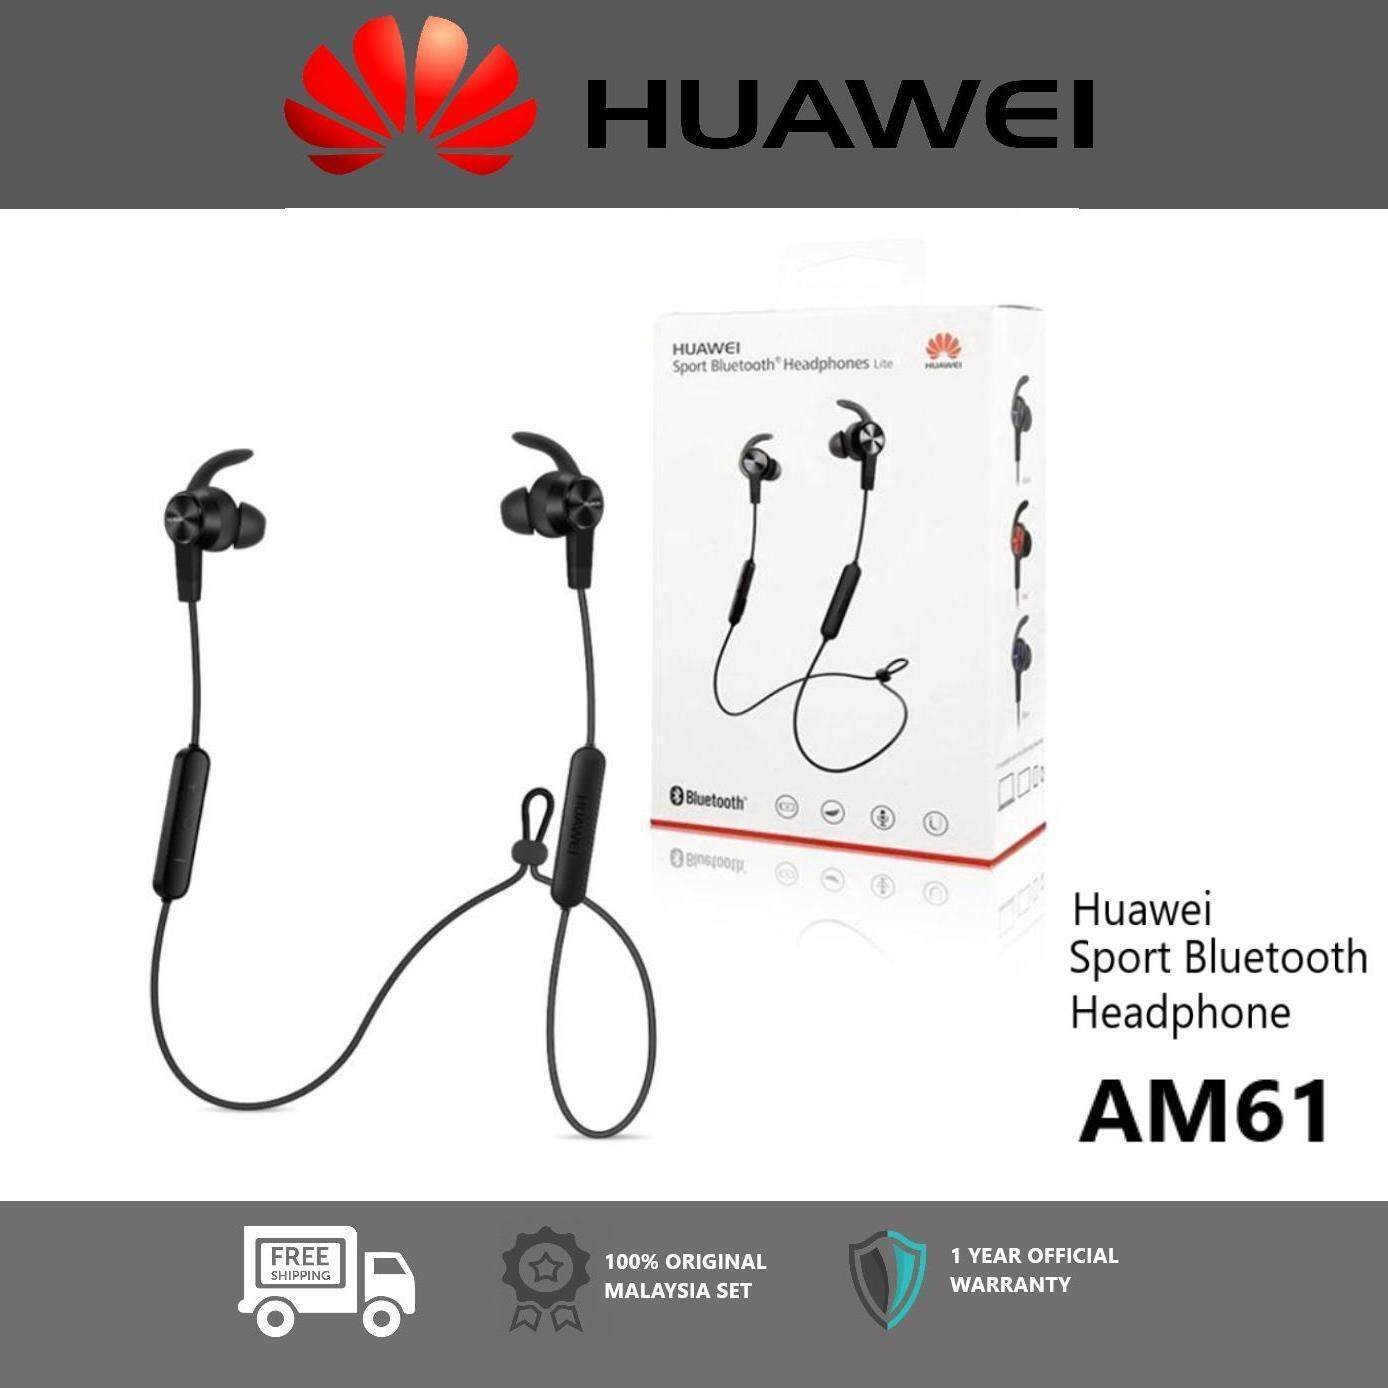 4aa28ebe488 Huawei Headphones & Headsets price in Malaysia - Best Huawei ...